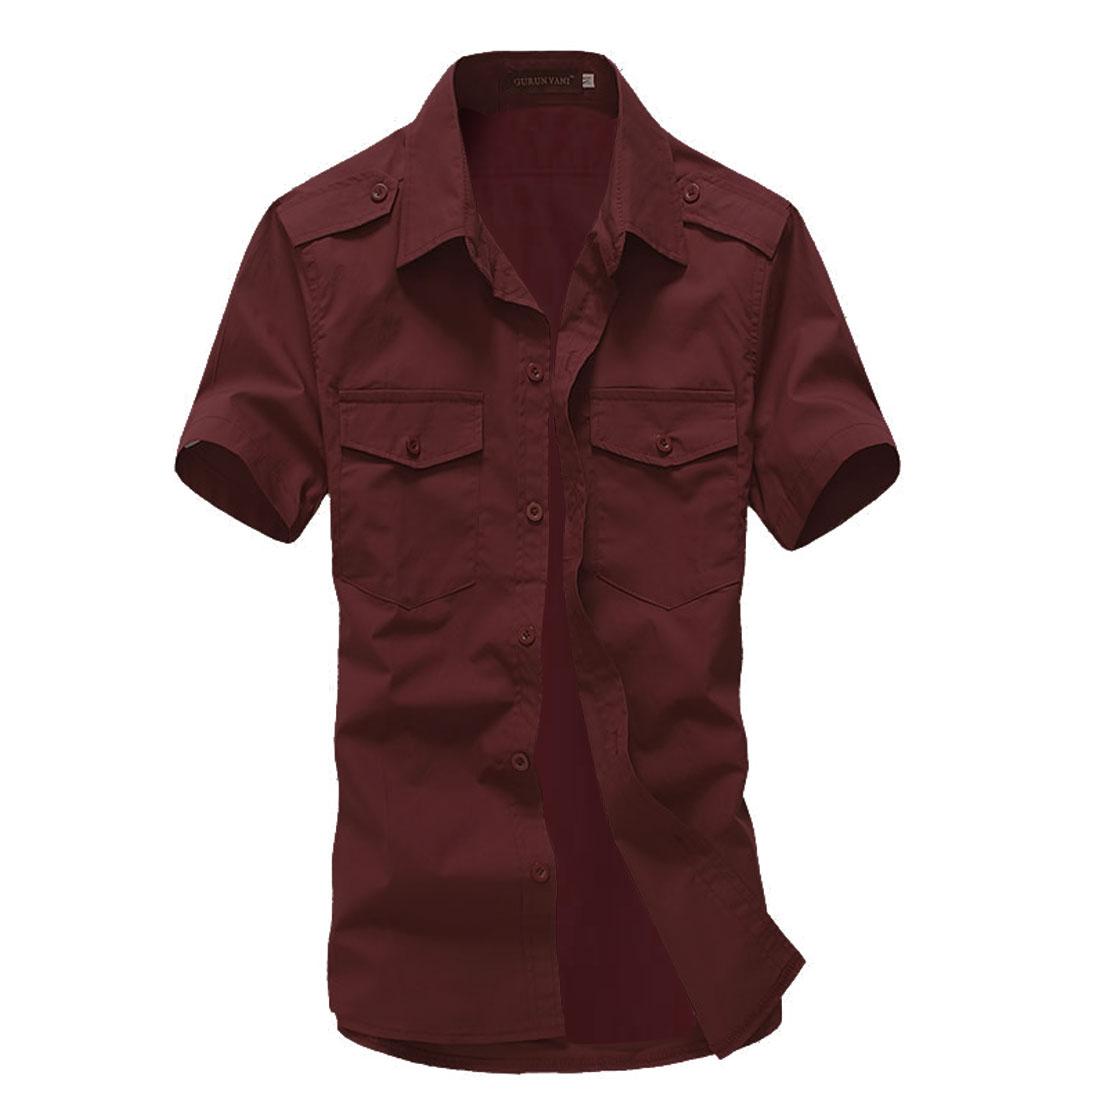 Men Short-sleeved Buttons Front Flap Pockets Shirt Burgundy L